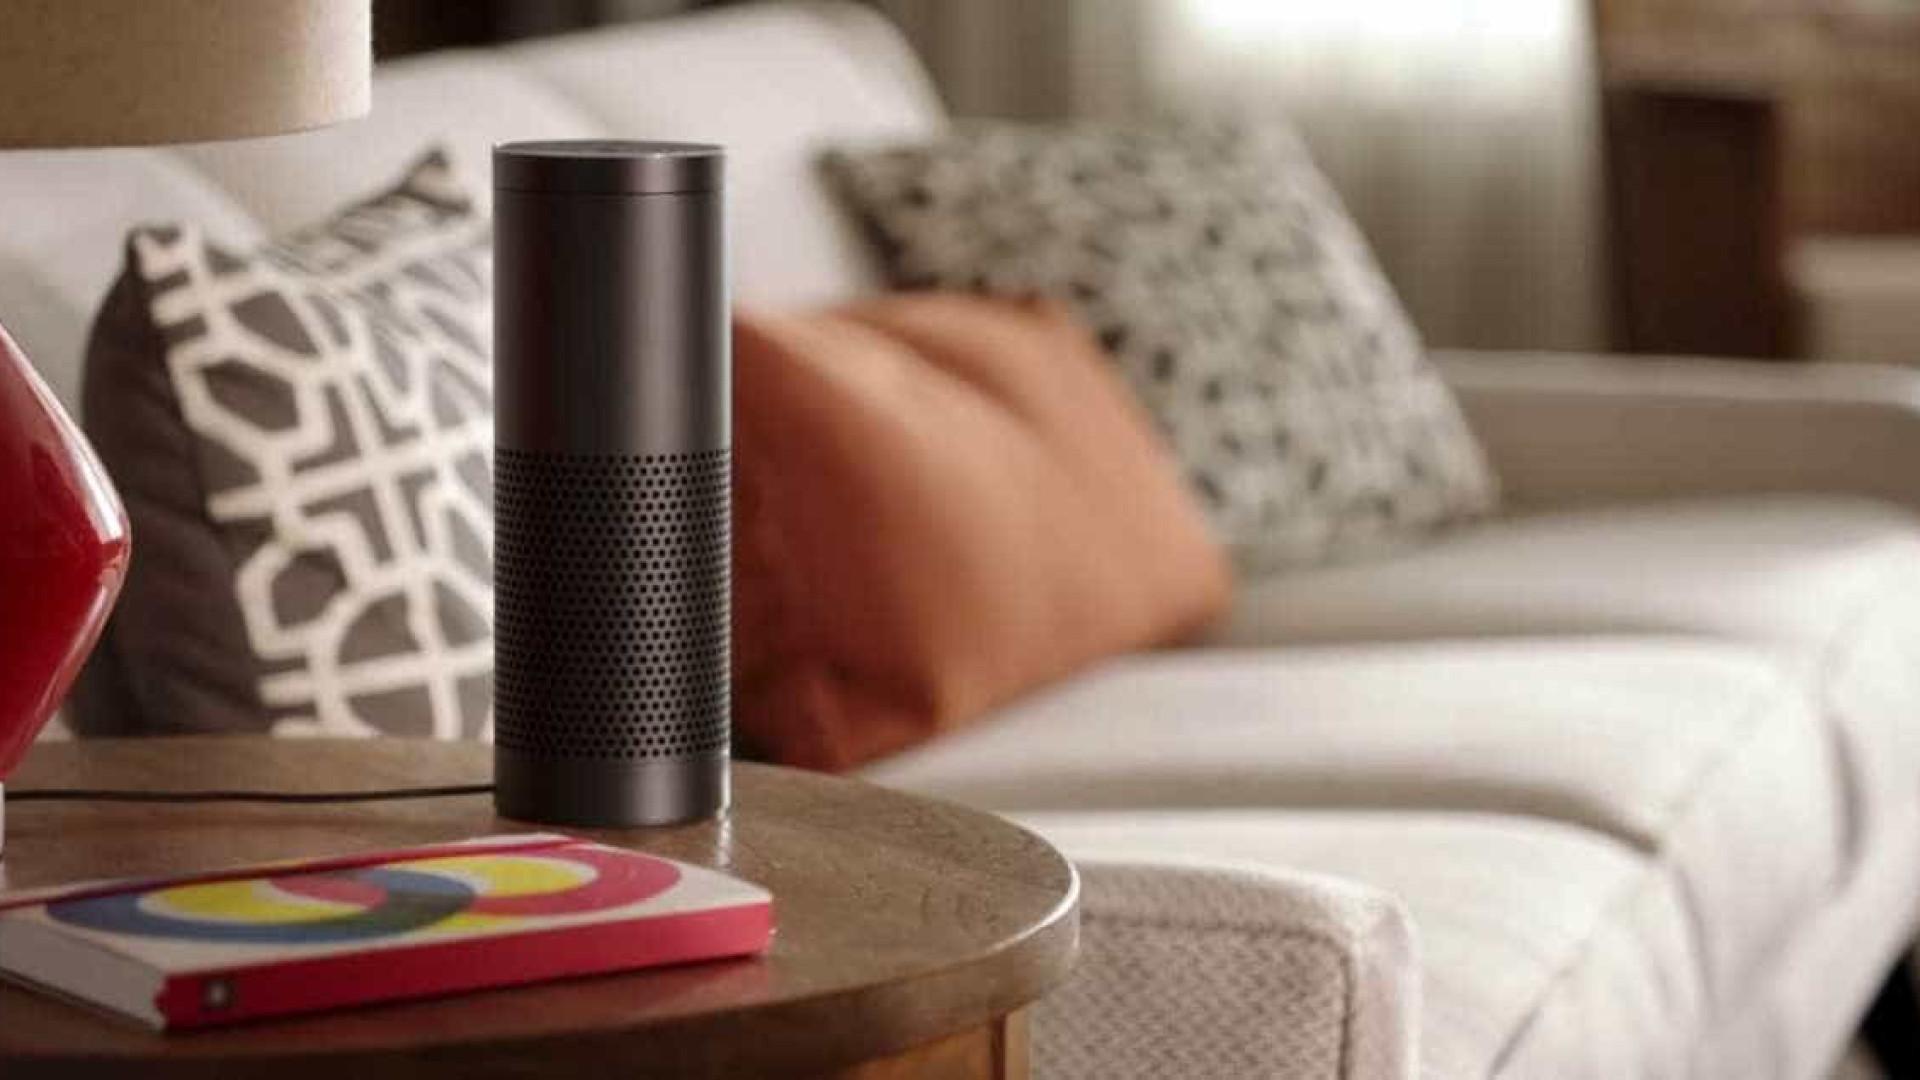 Caso curioso coloca assistente digital da Amazon sob suspeita